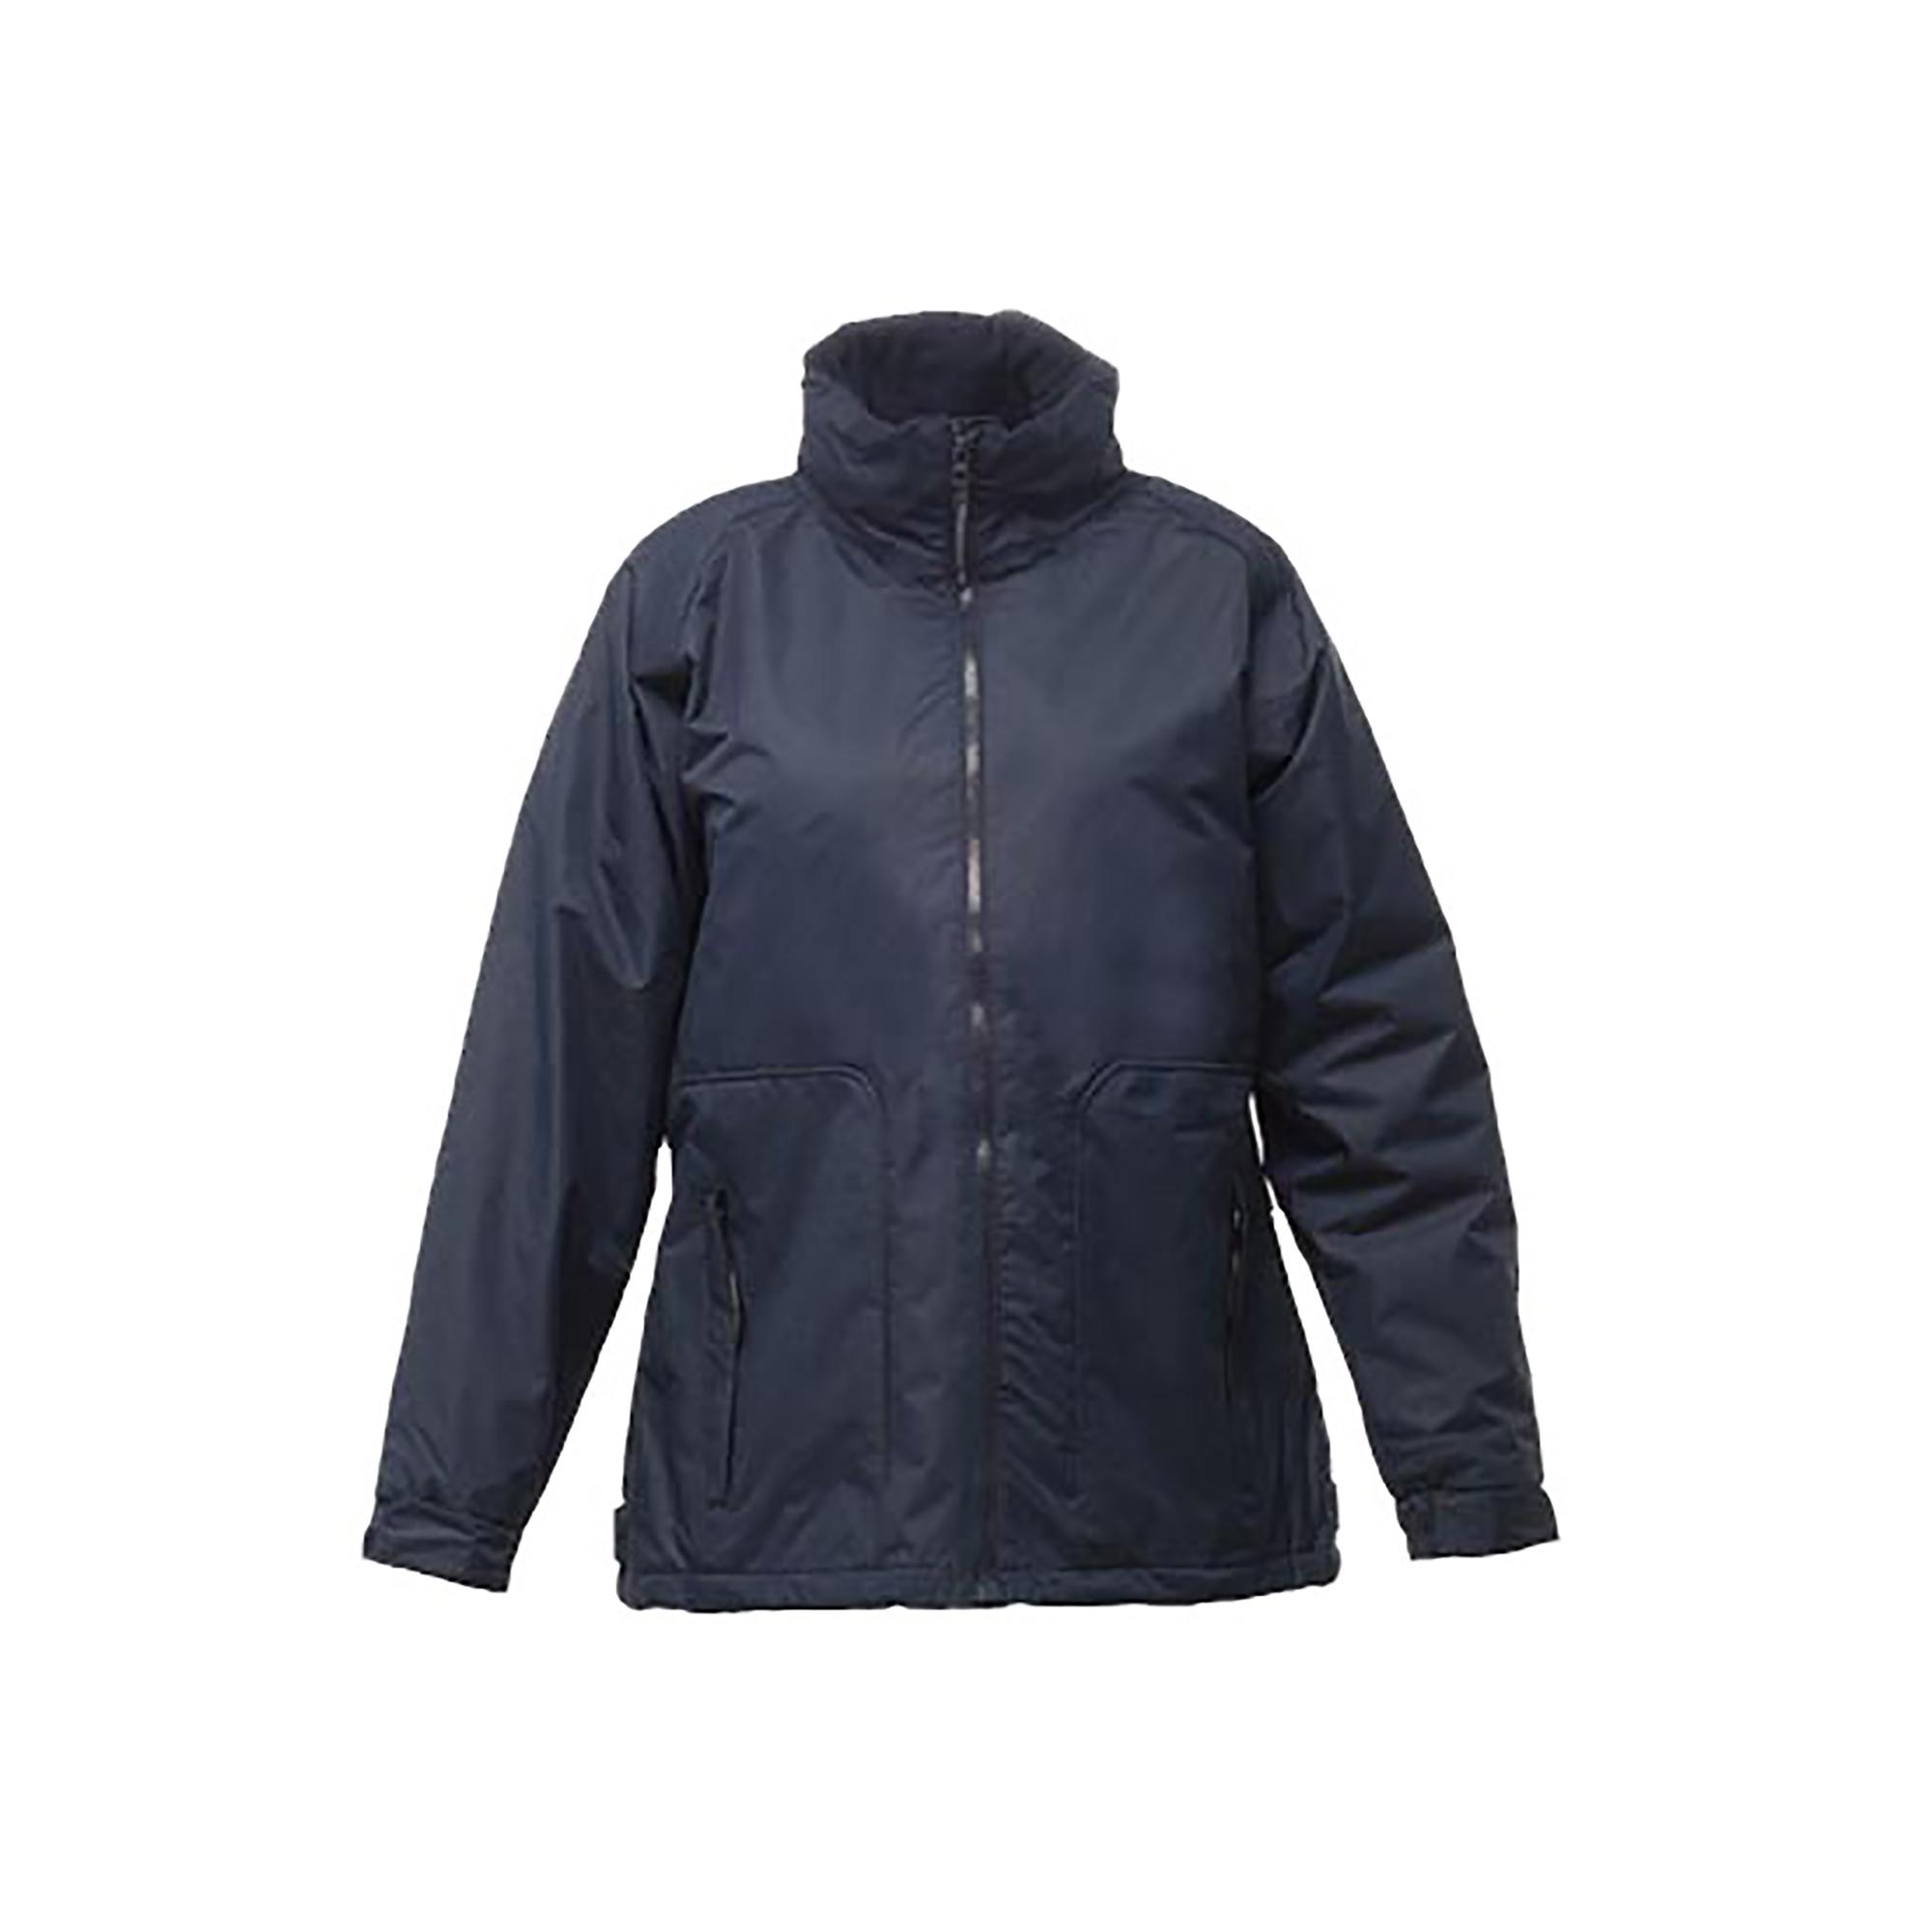 Regatta Ladies/Womens Waterproof Windproof Jacket (10 UK) (Navy Blue)